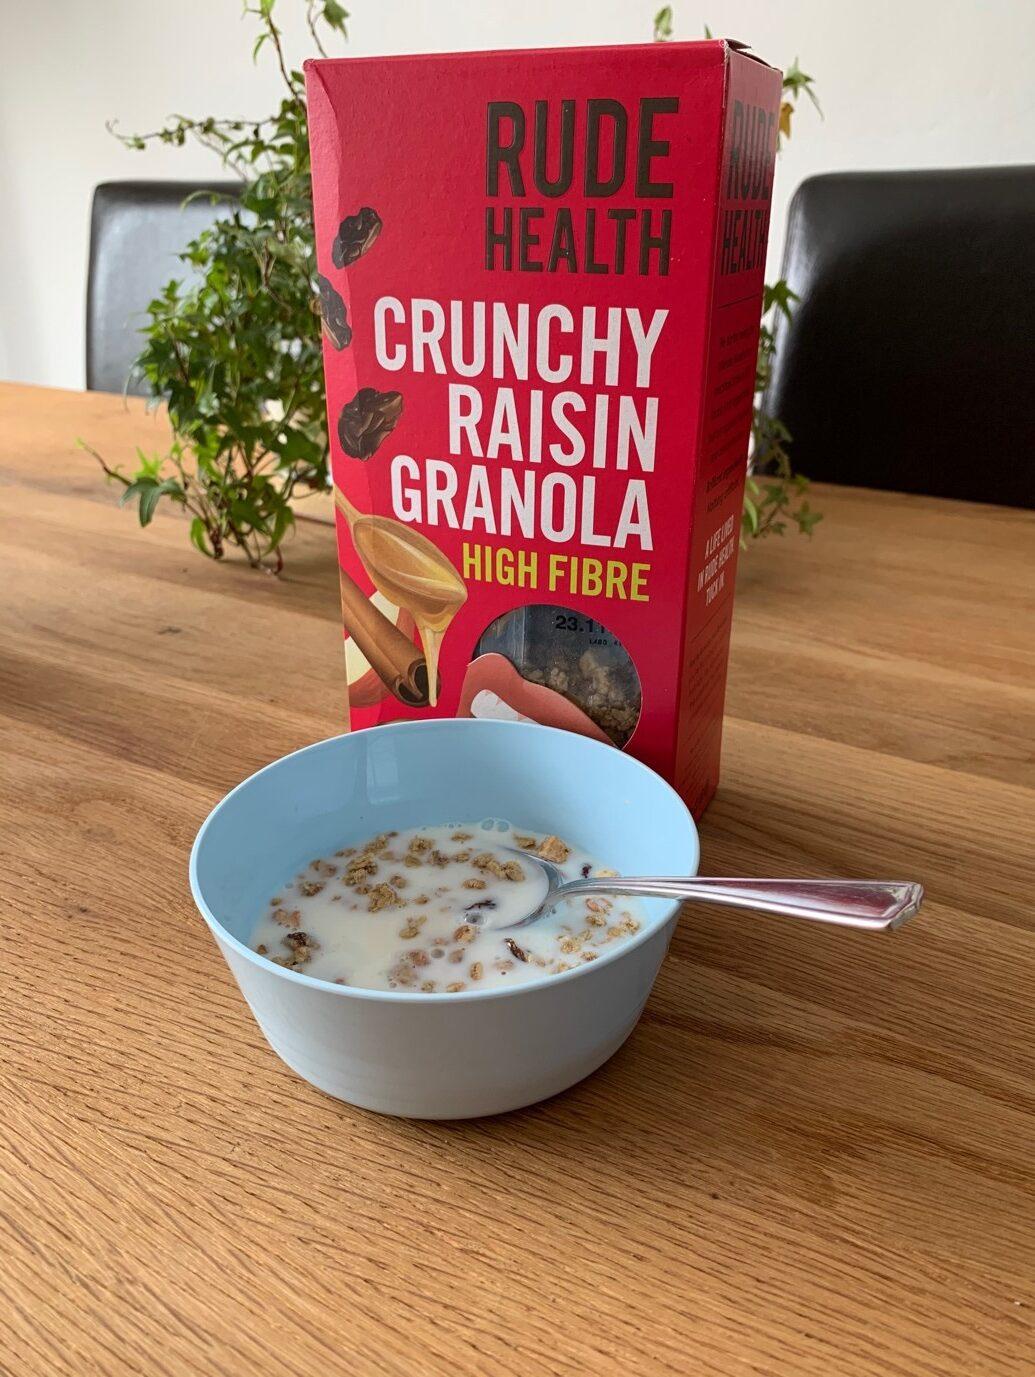 Rude Health Crunch Raisin Granola